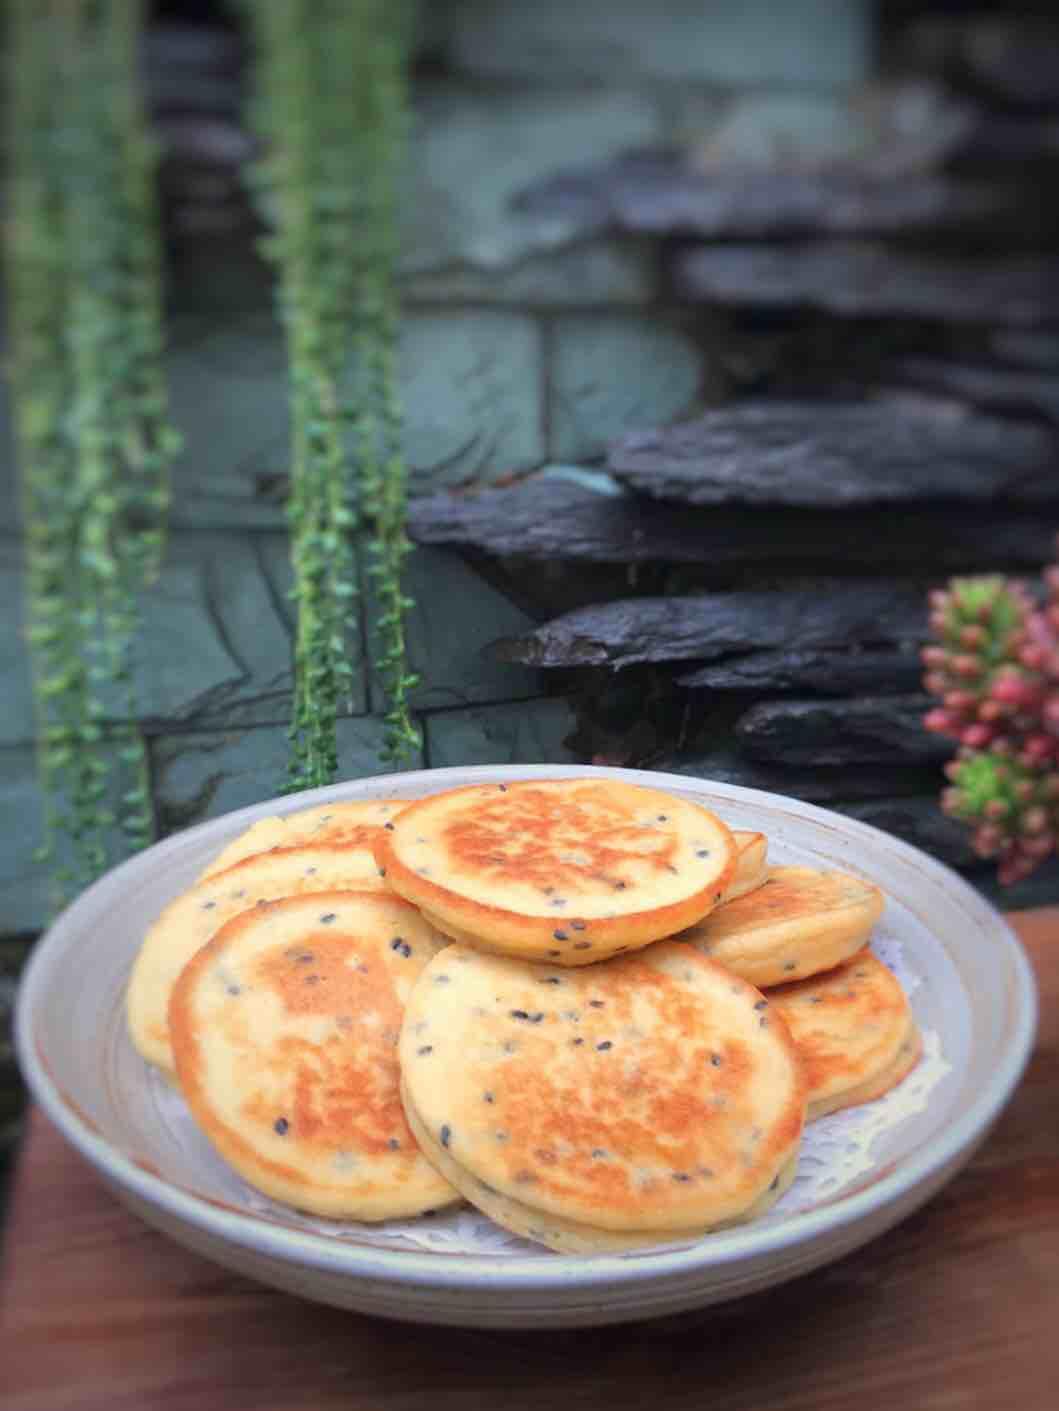 黄豆鸡蛋早餐饼